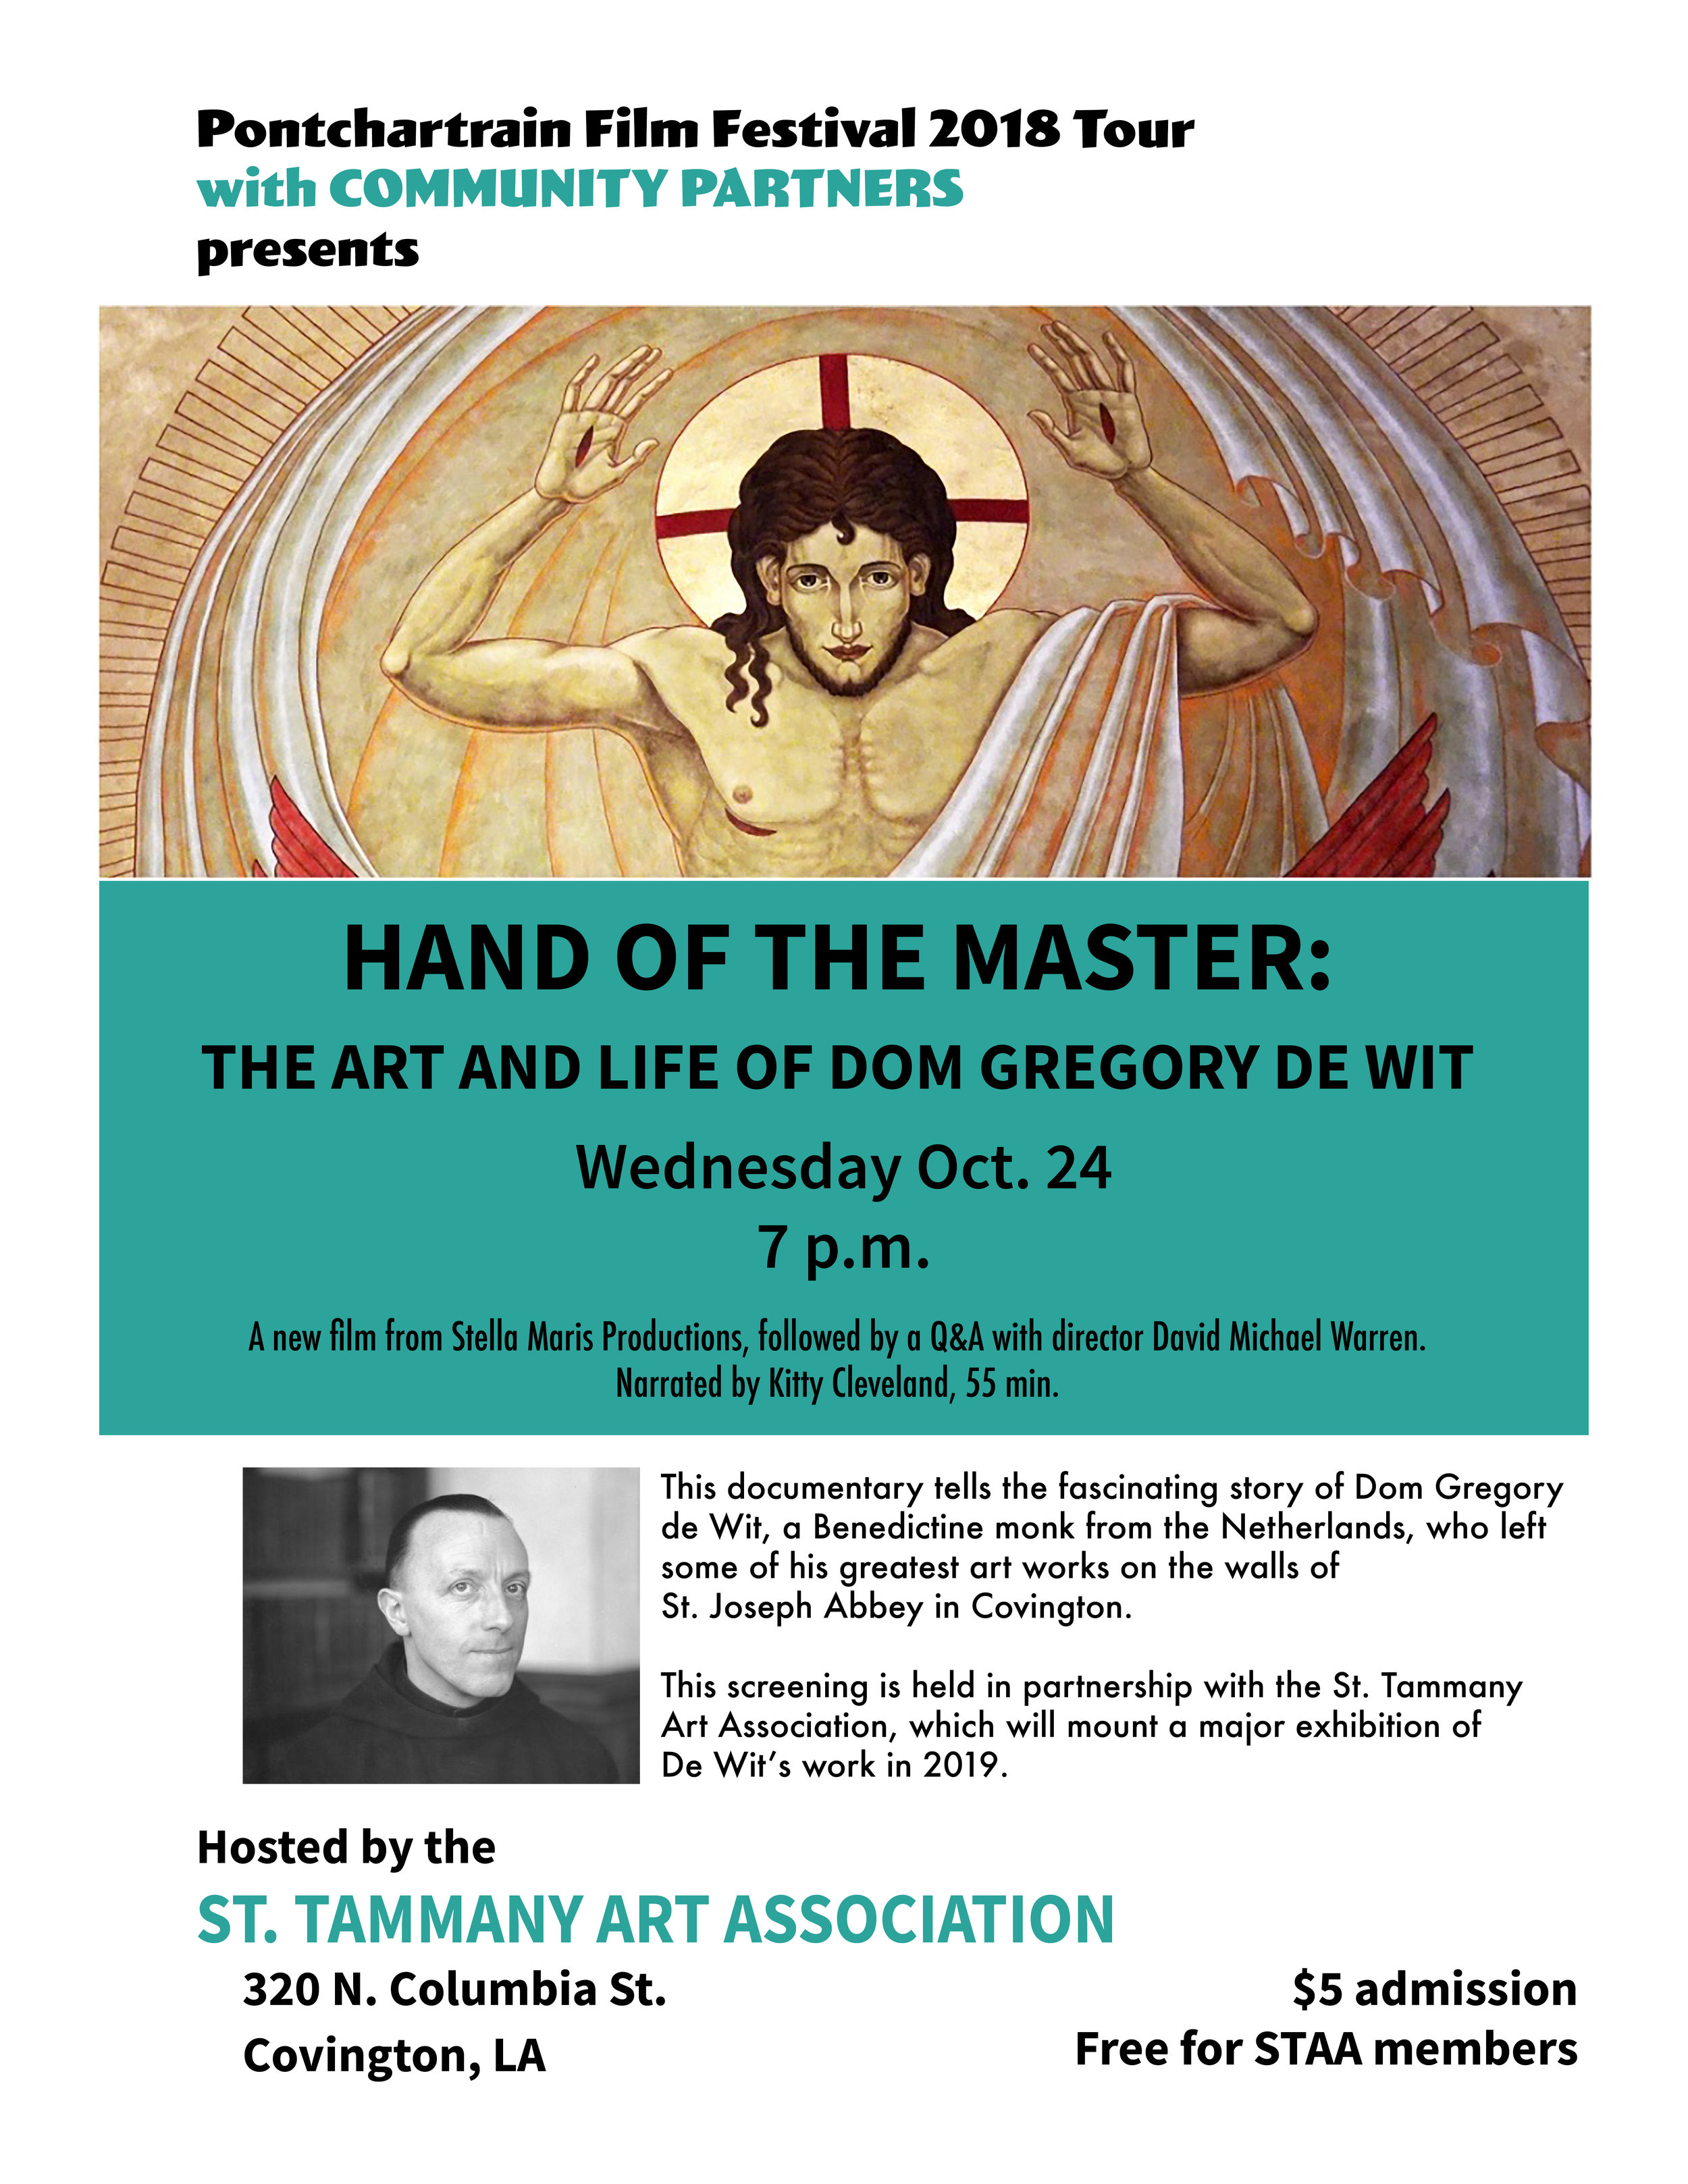 Hand of the Master Pontchartrain Film Fest 2018 Tour